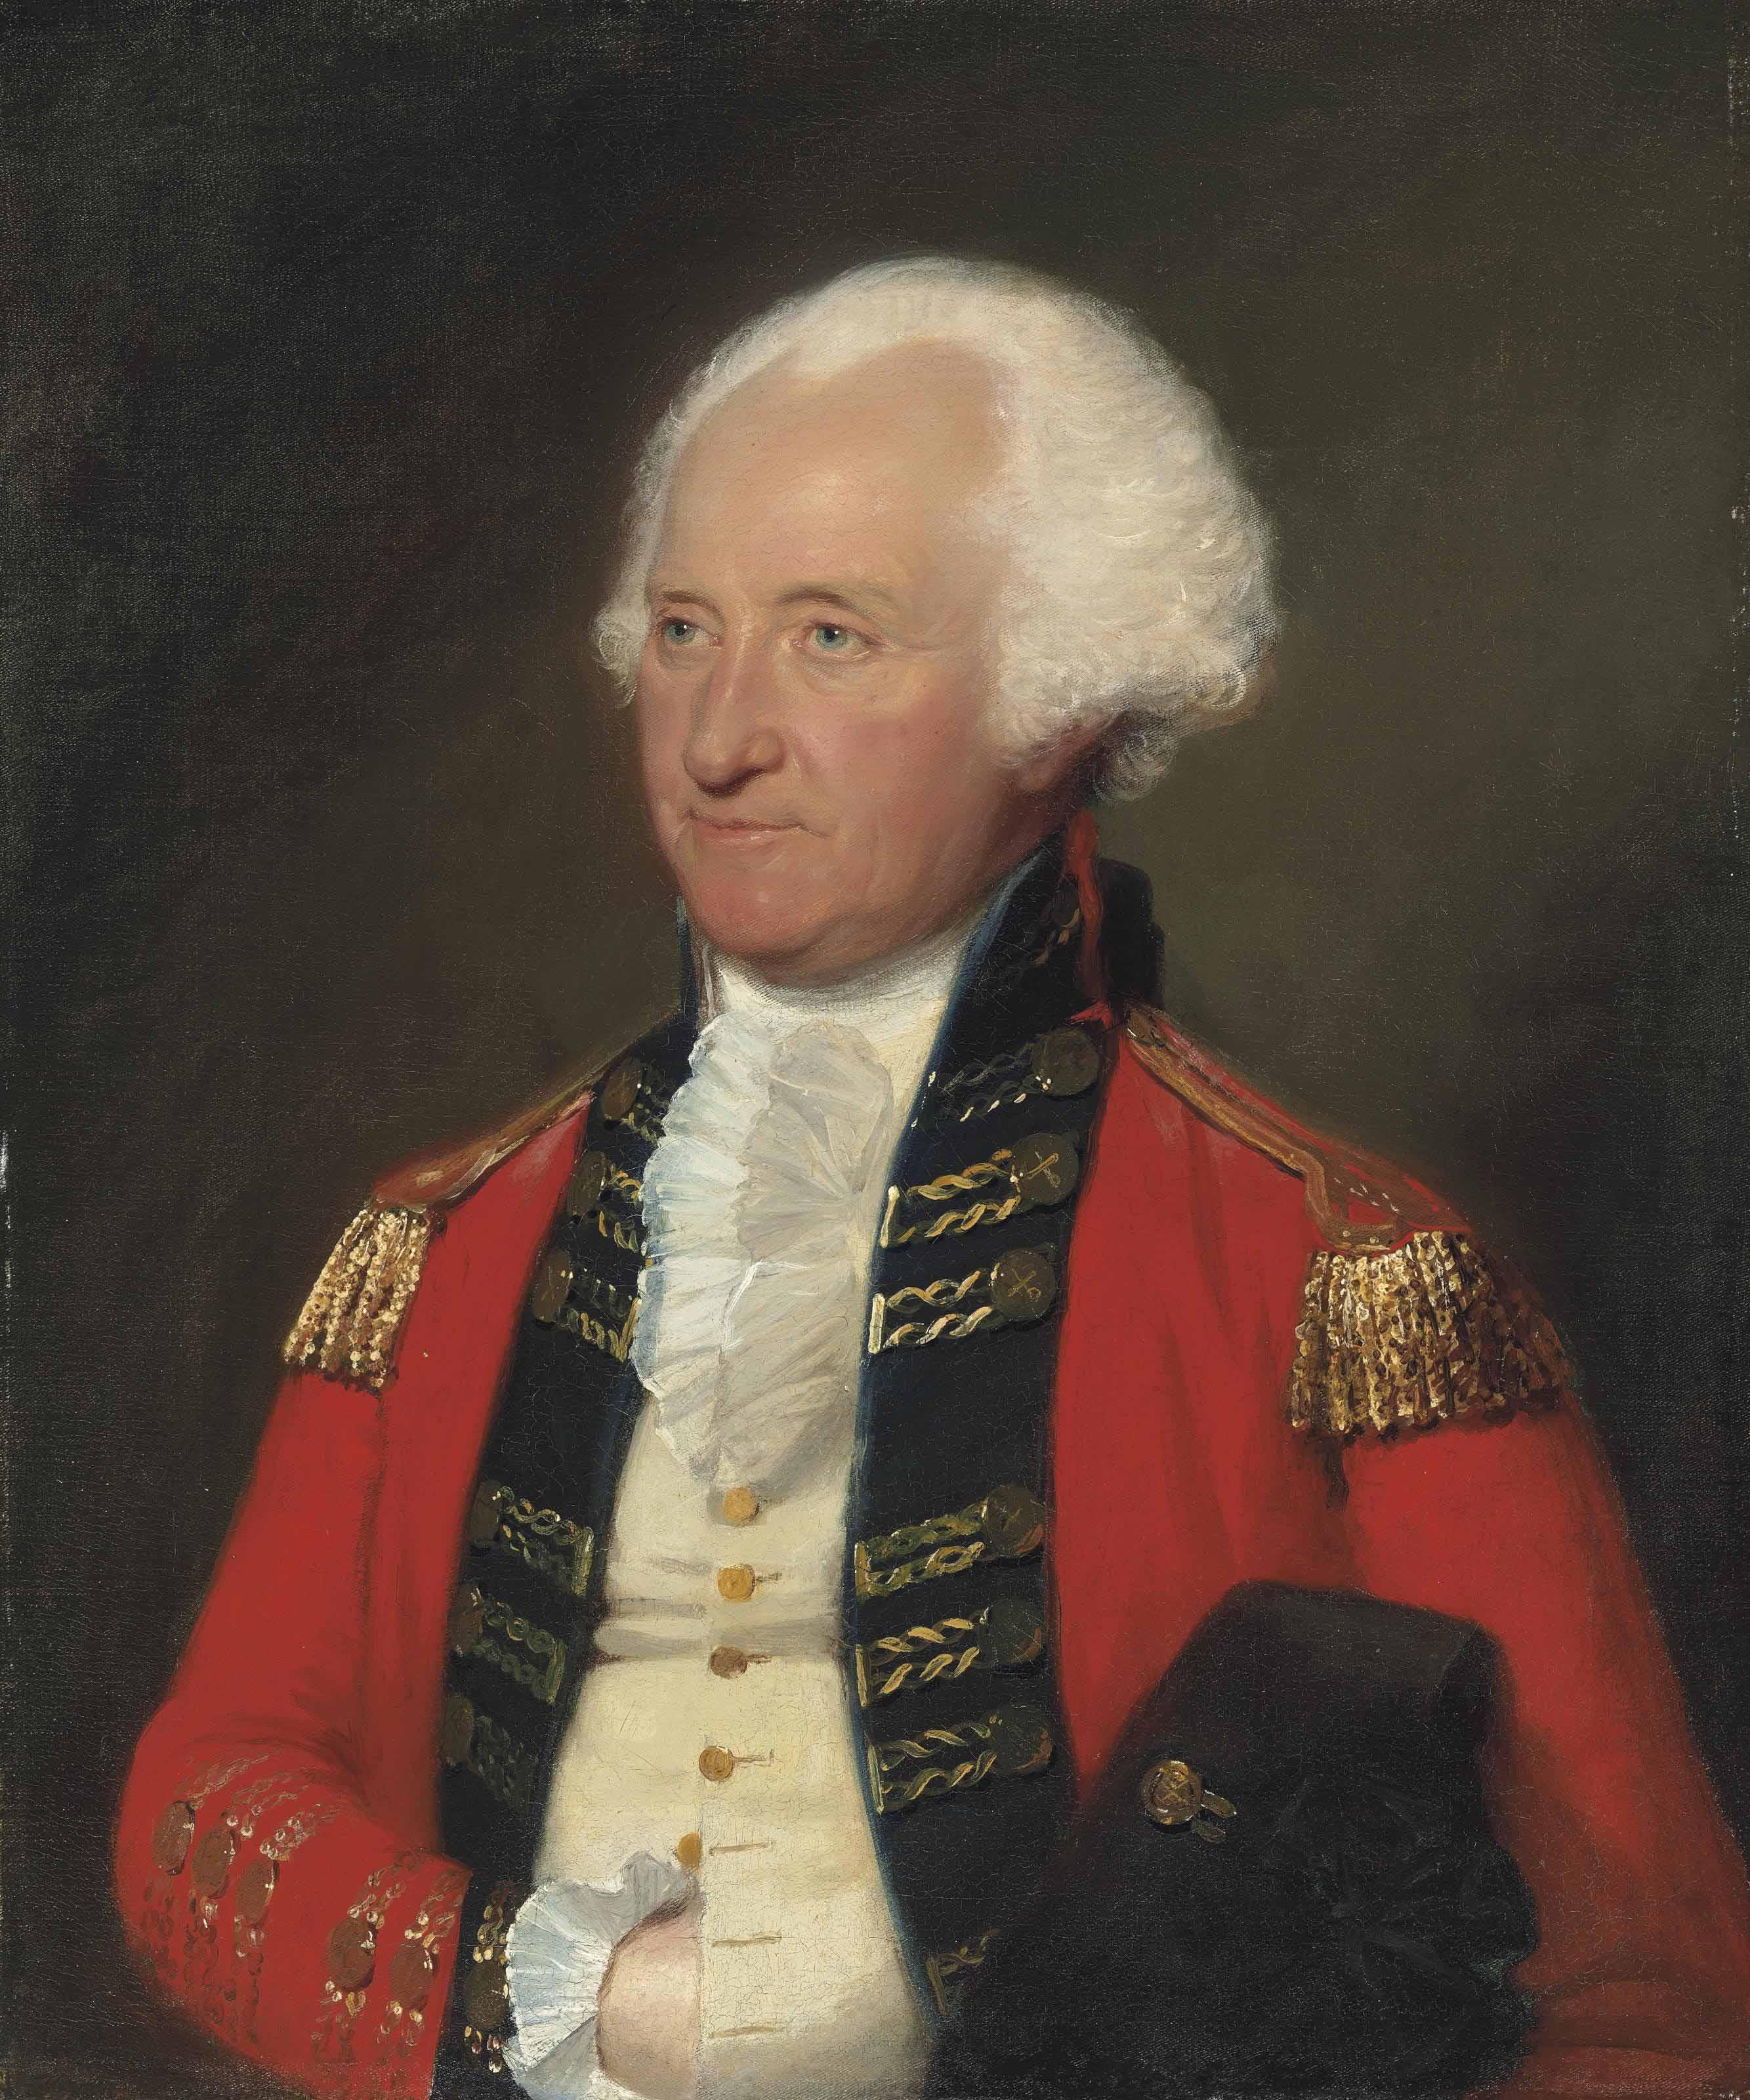 Portrait of General James Pattison (1723-1805), half-length, in military uniform